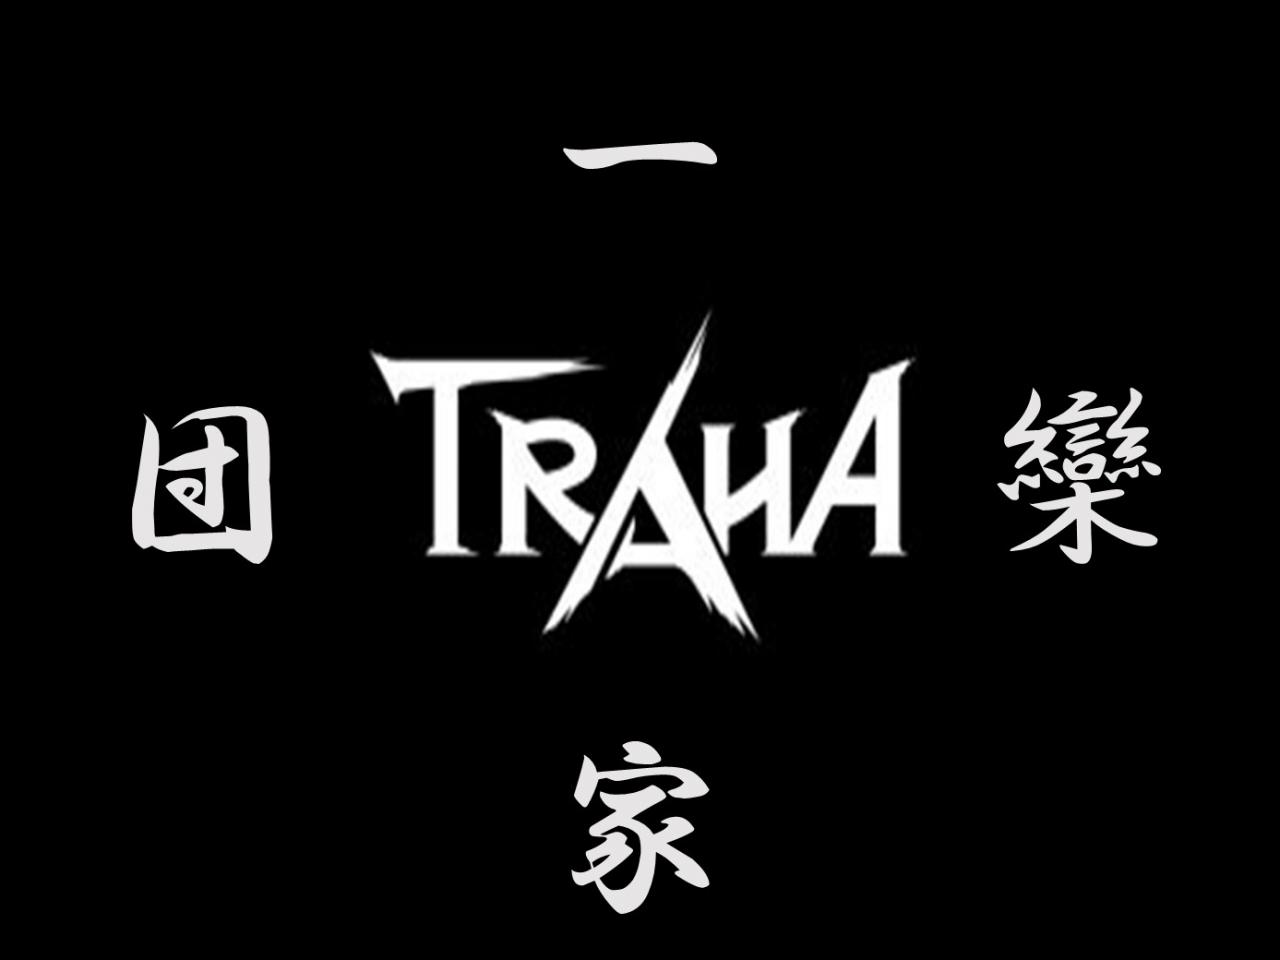 【TRAHA】ギルドメンバー募集用掲示板【ヘイグ攻略まとめWiki】